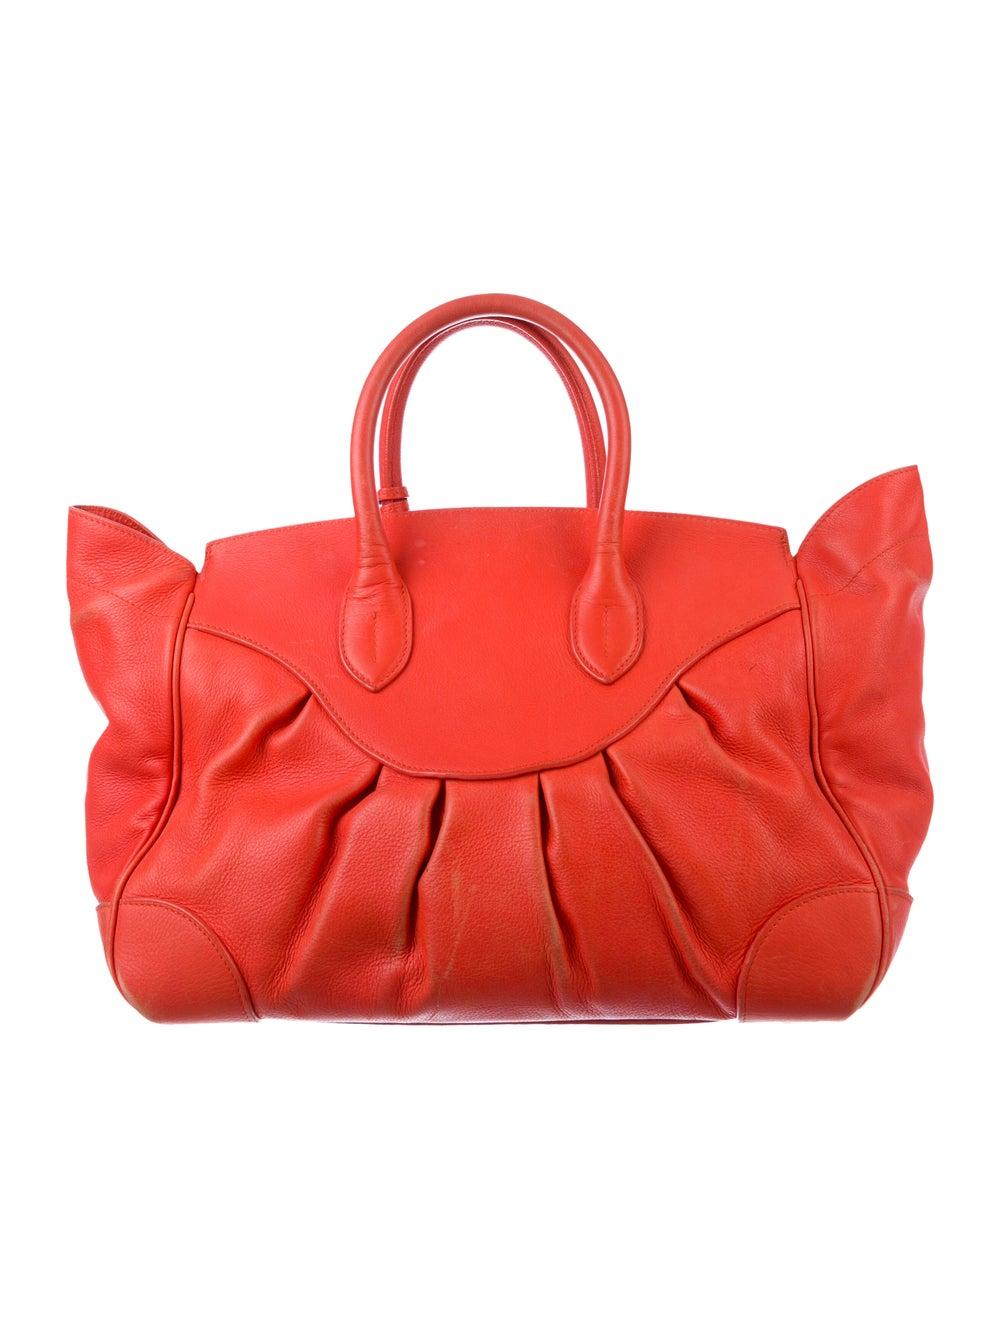 Ralph Lauren Puffy Ricky Bag gold - image 4